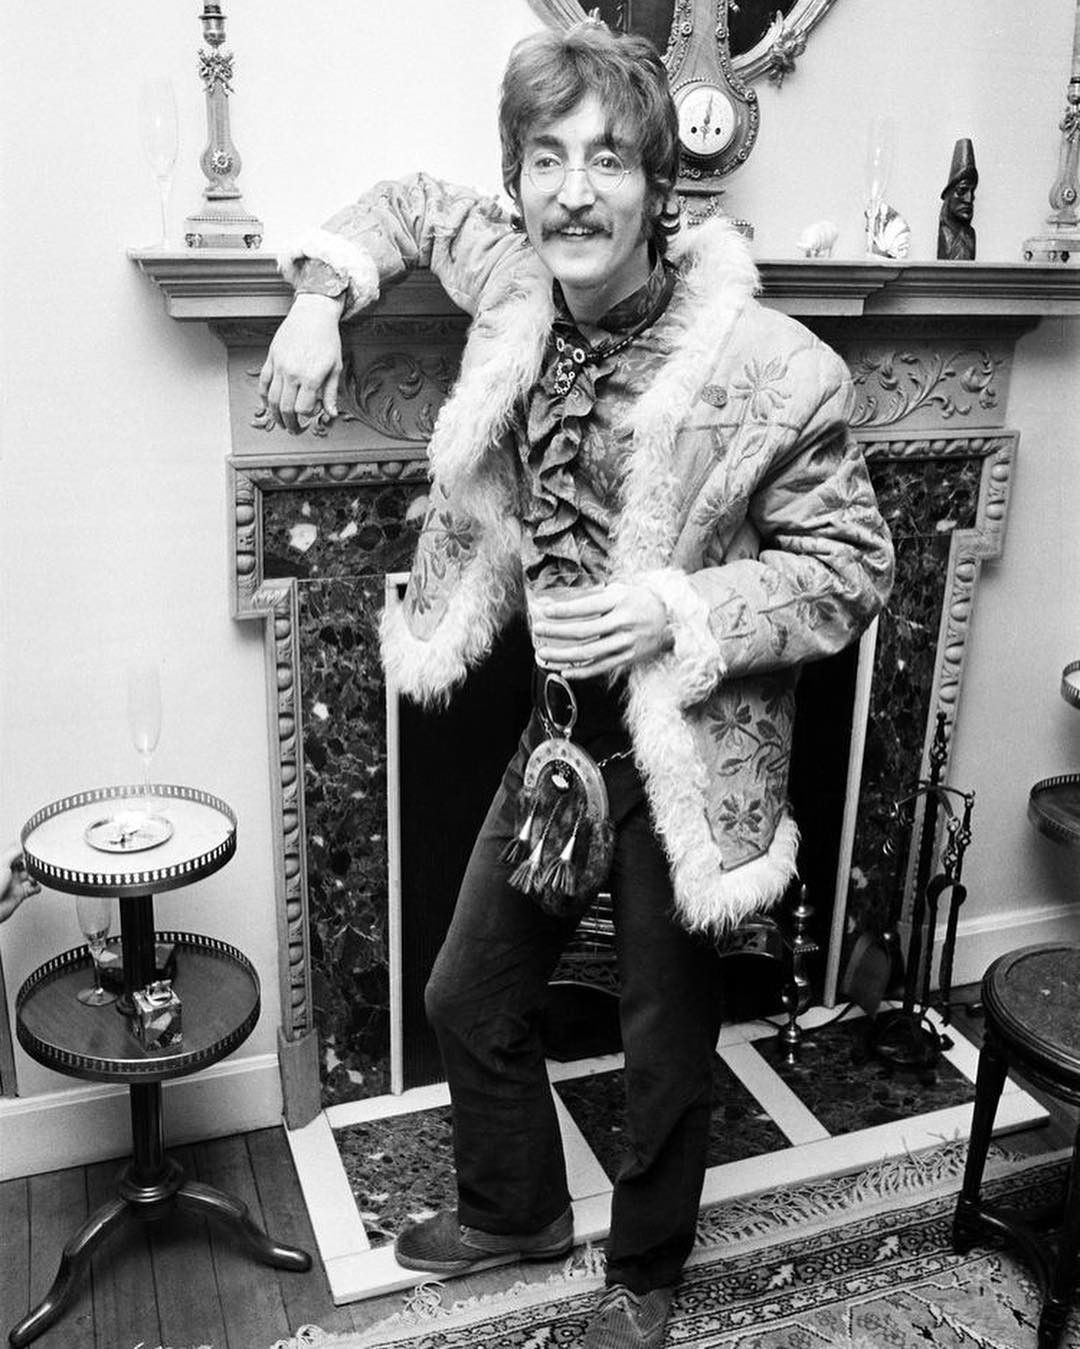 Lennon John lennon fashion, John lennon beatles, John lennon